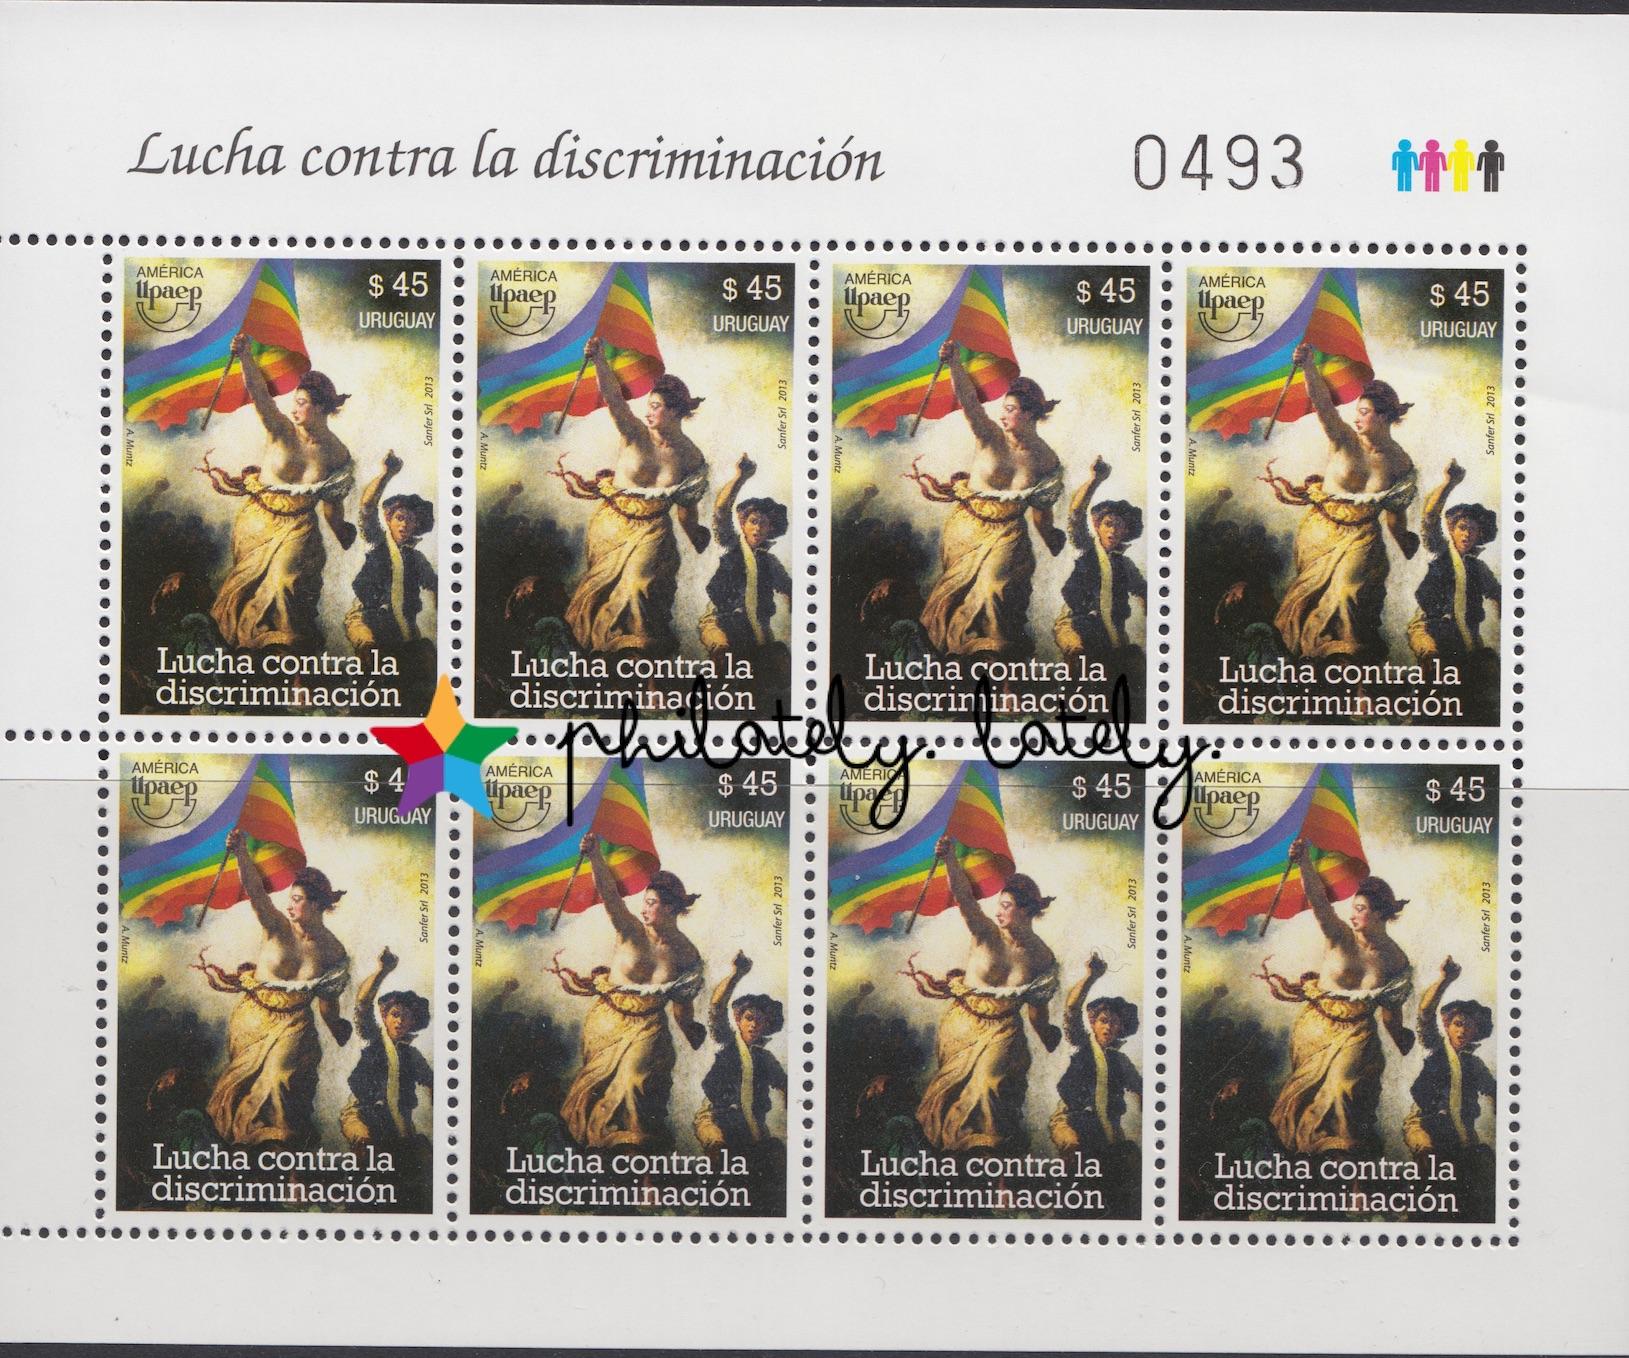 002_Uruguay_LGBT_Stamps